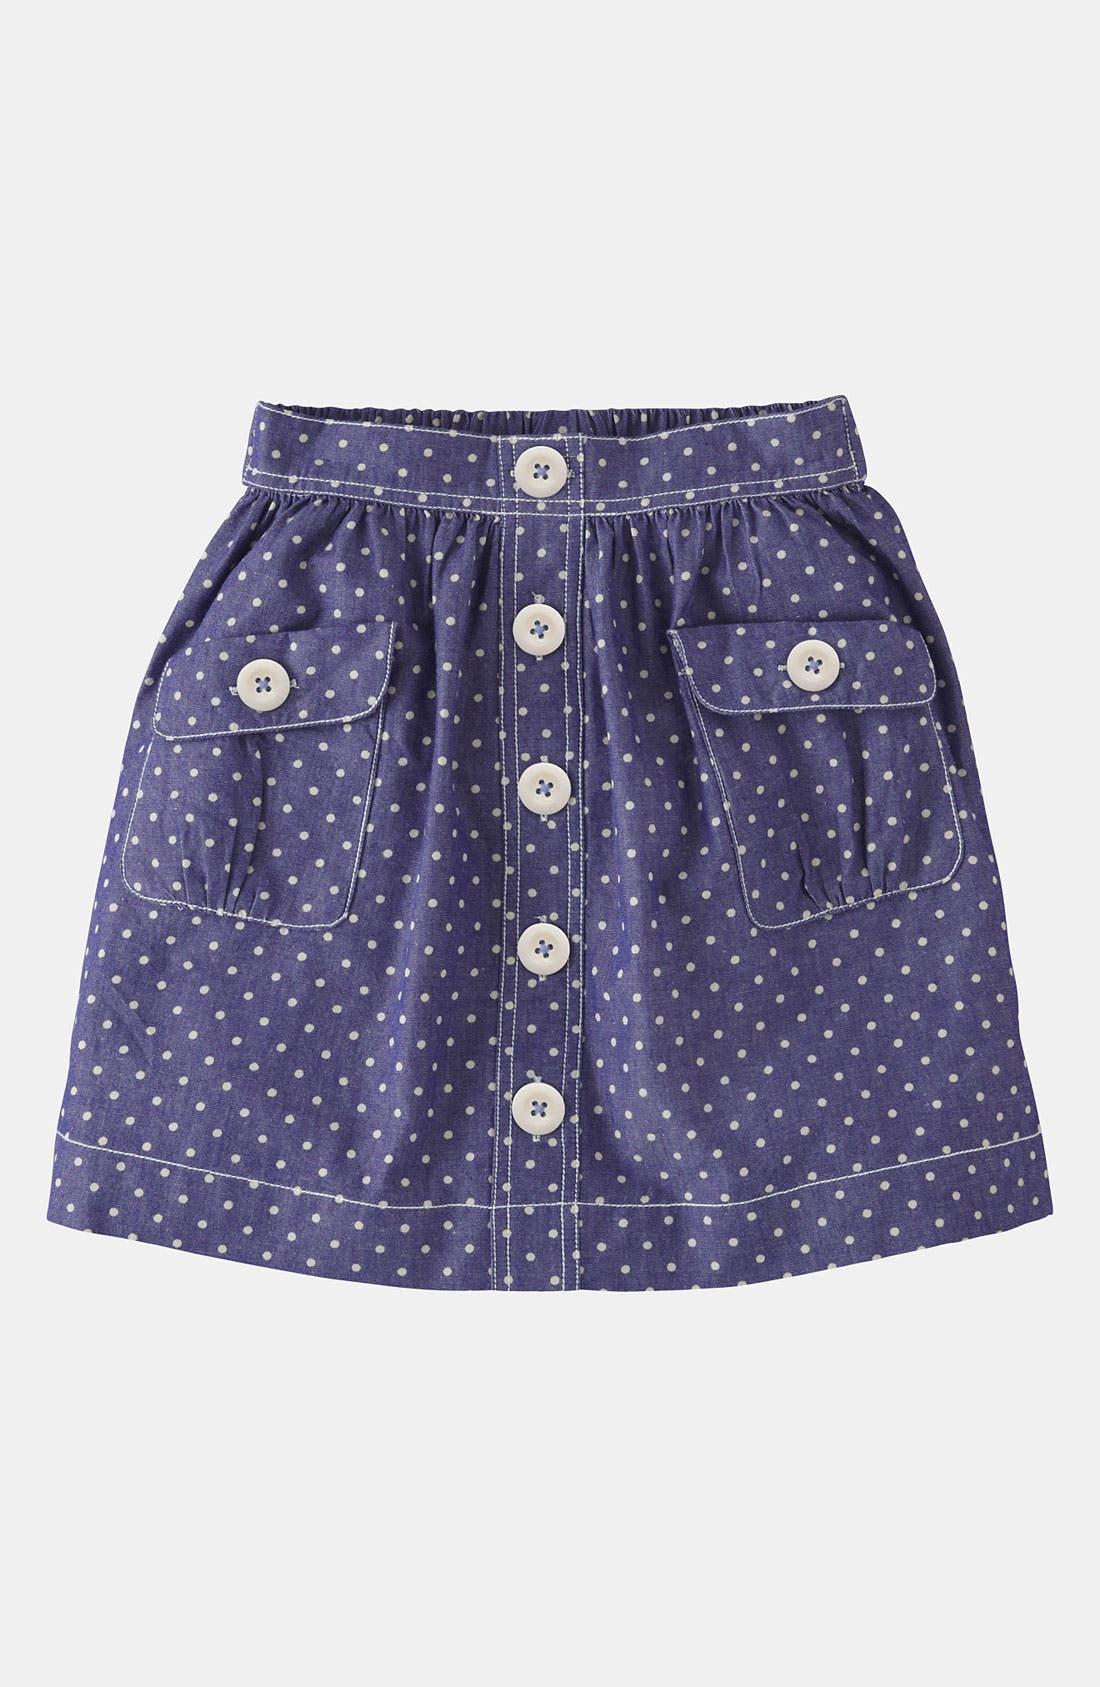 Main Image - Mini Boden 'Spotty' Chambray Skirt (Little Girls & Big Girls)